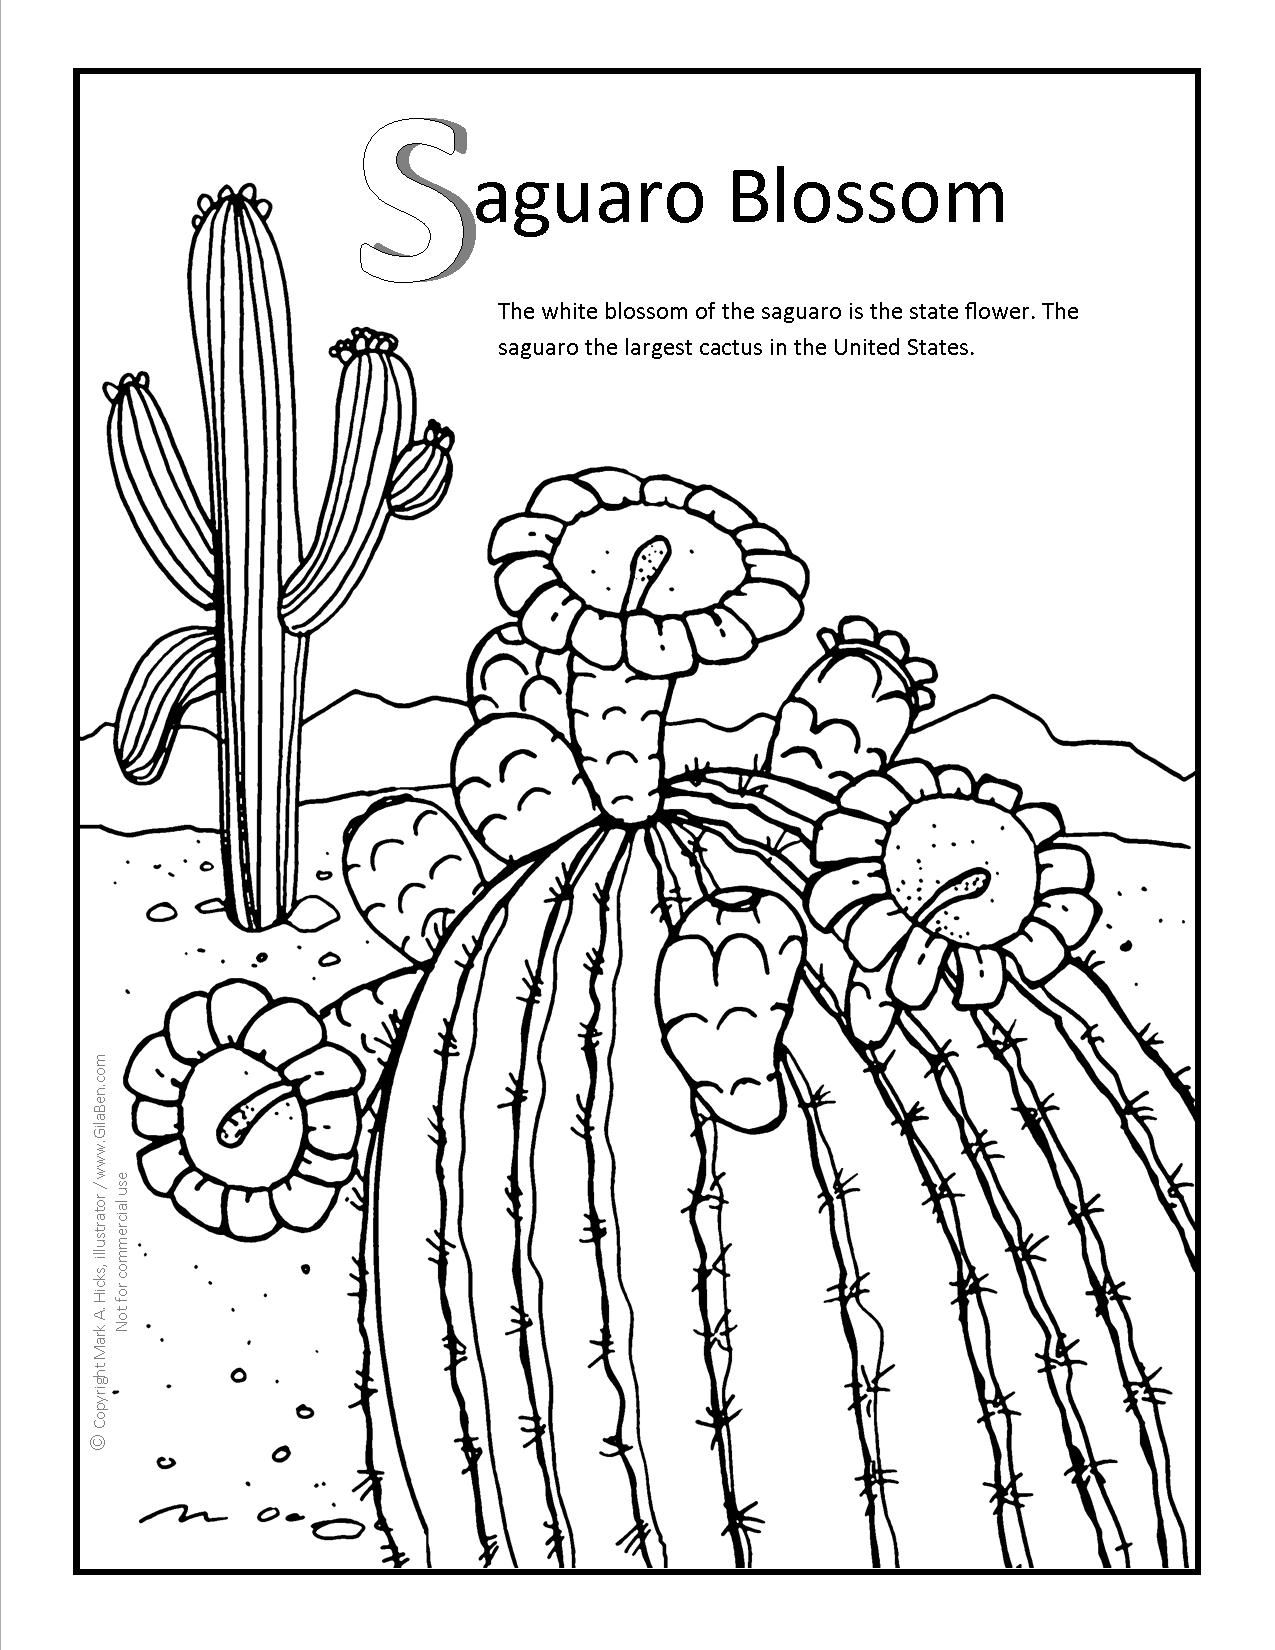 Saguaro Blossom Coloring page at GilaBen.com | Arizona Coloring ...